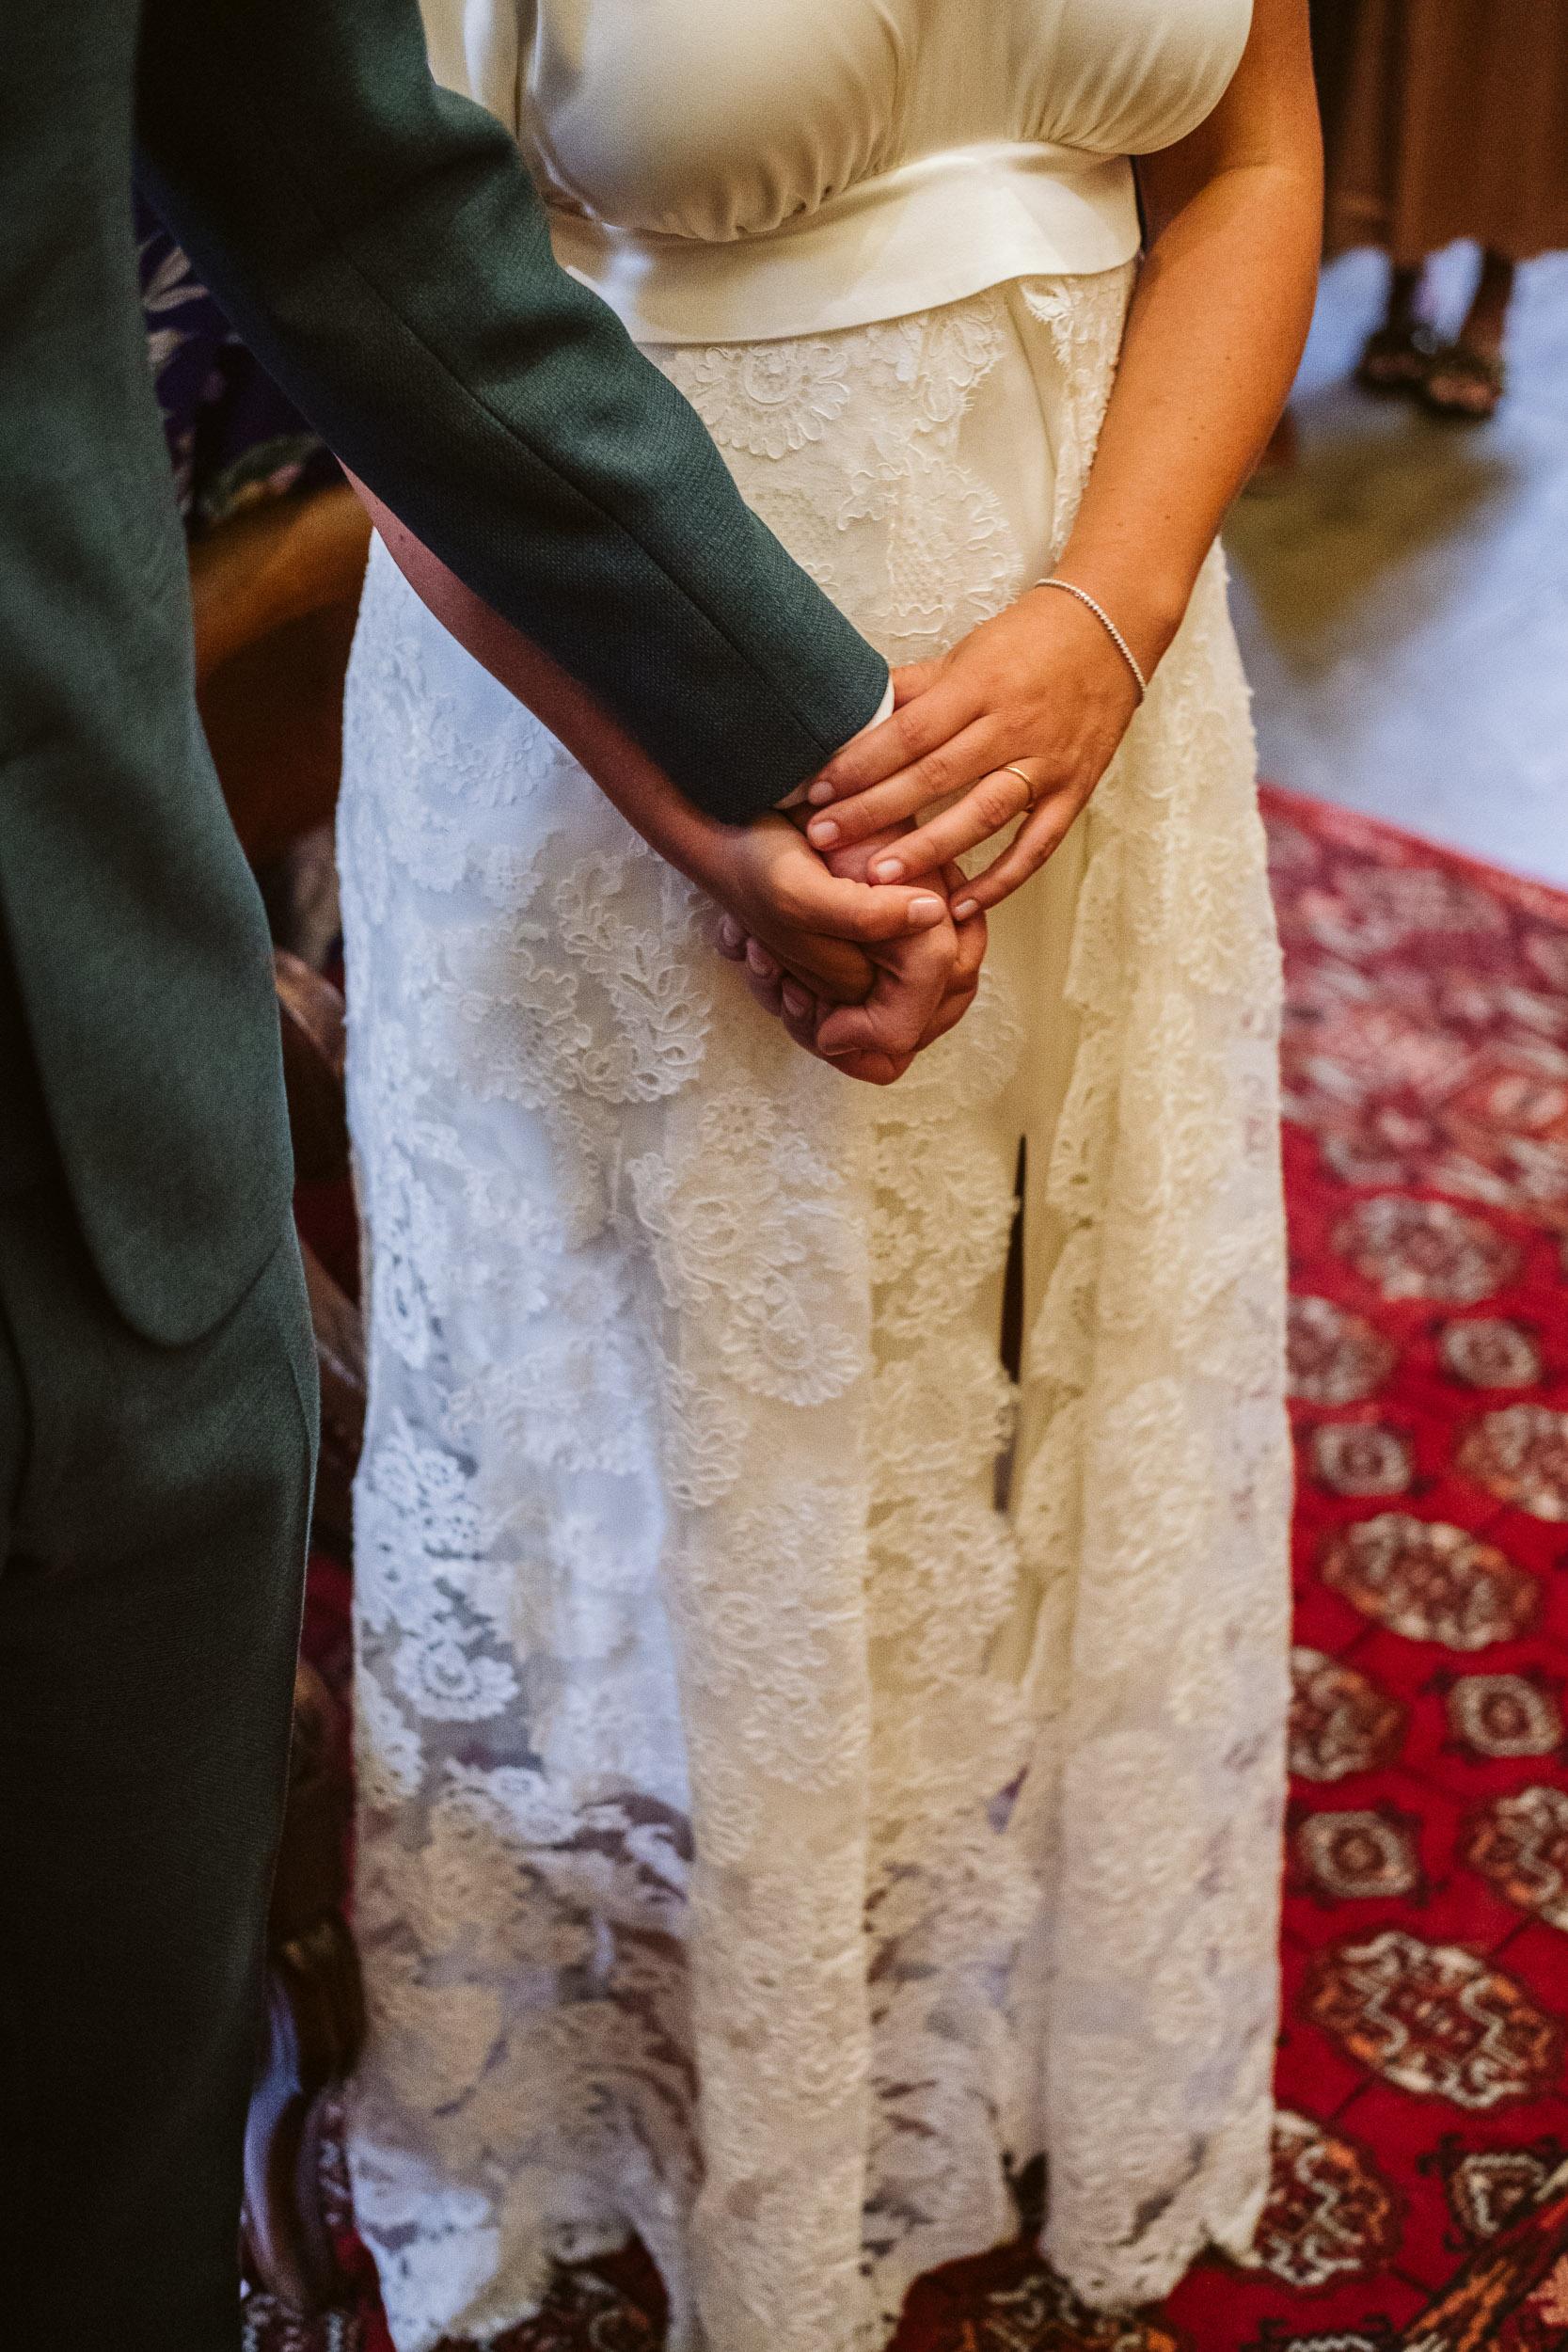 gerald-mattel-photographe-mariage-annecy-verrier-menthon-6.jpg